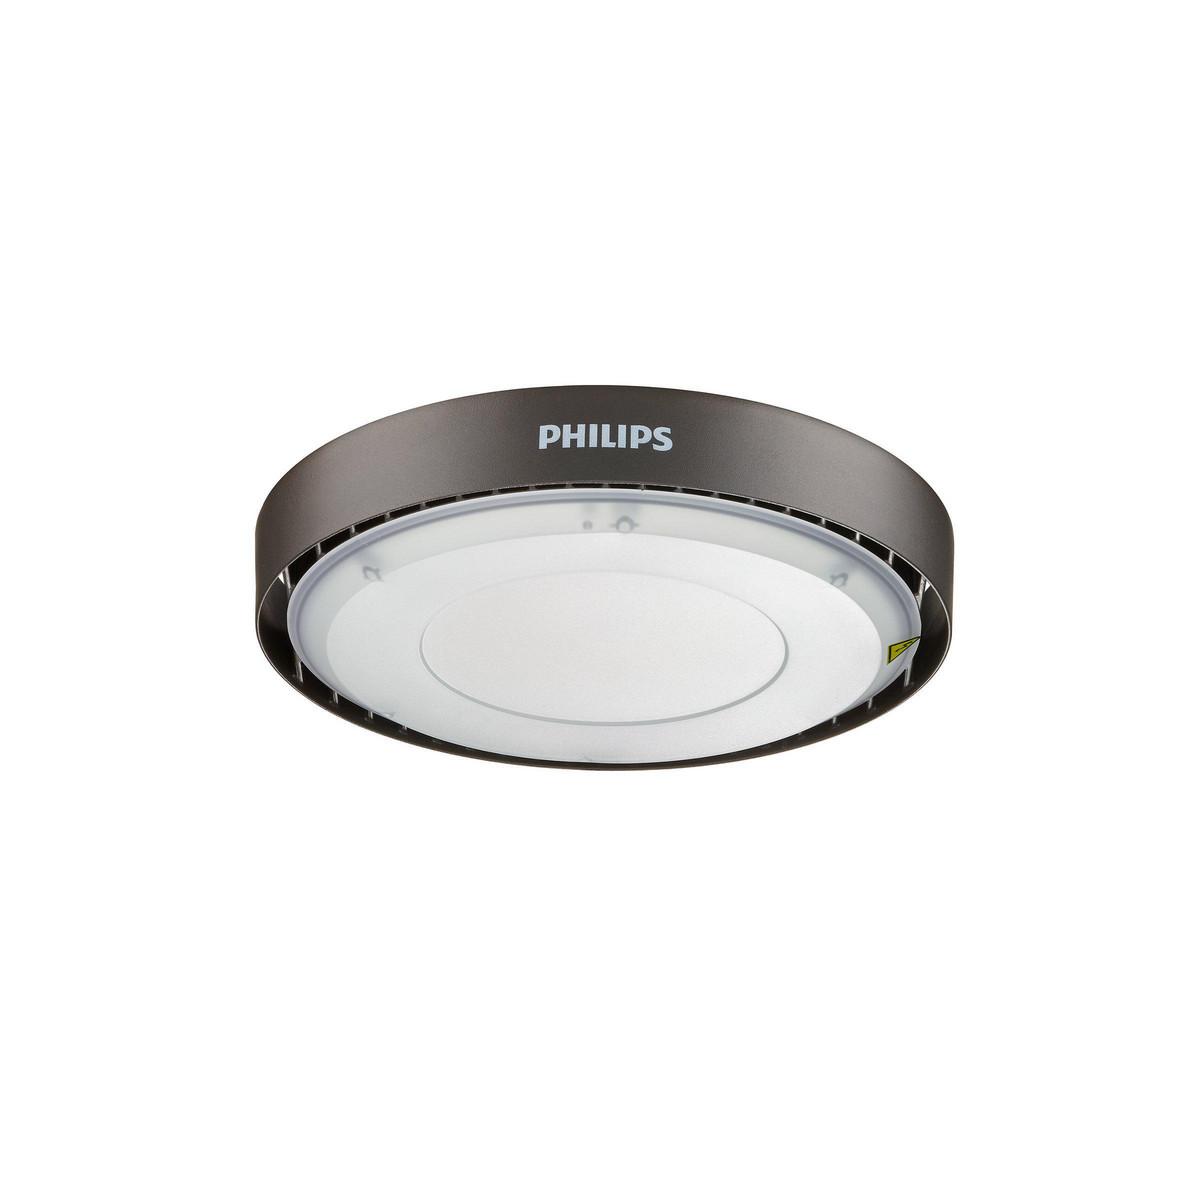 Philips Ledinaire Highbay BY020P 10000lm/840 97W IP65 100° (WB) Grå